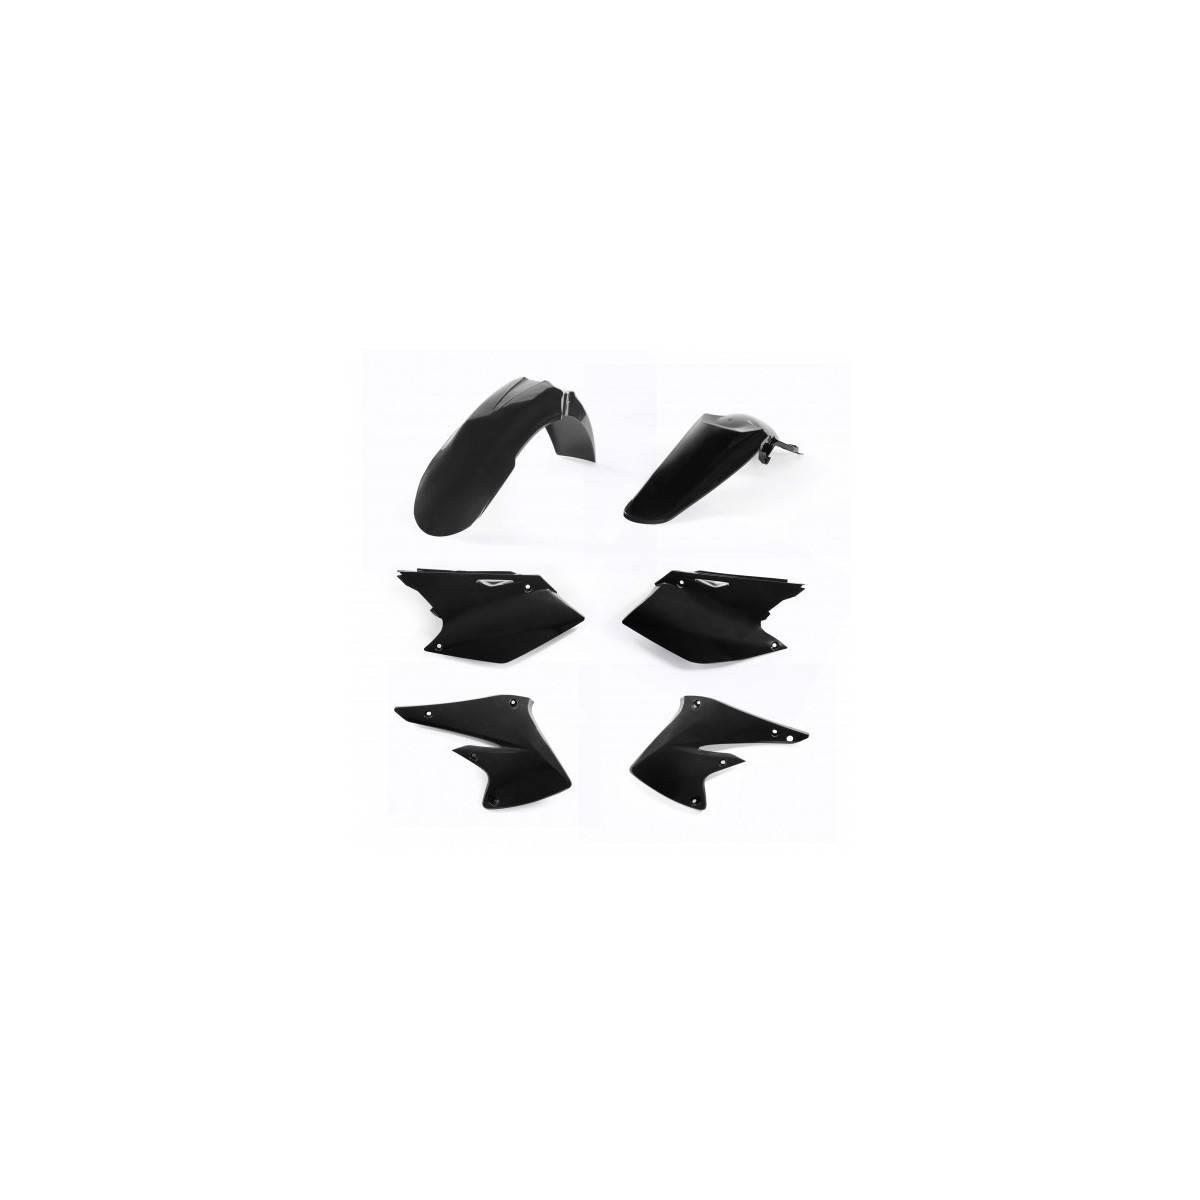 0017562-090 - Kit Plasticos Yzf 250 Yzf 450 14 17 Negro